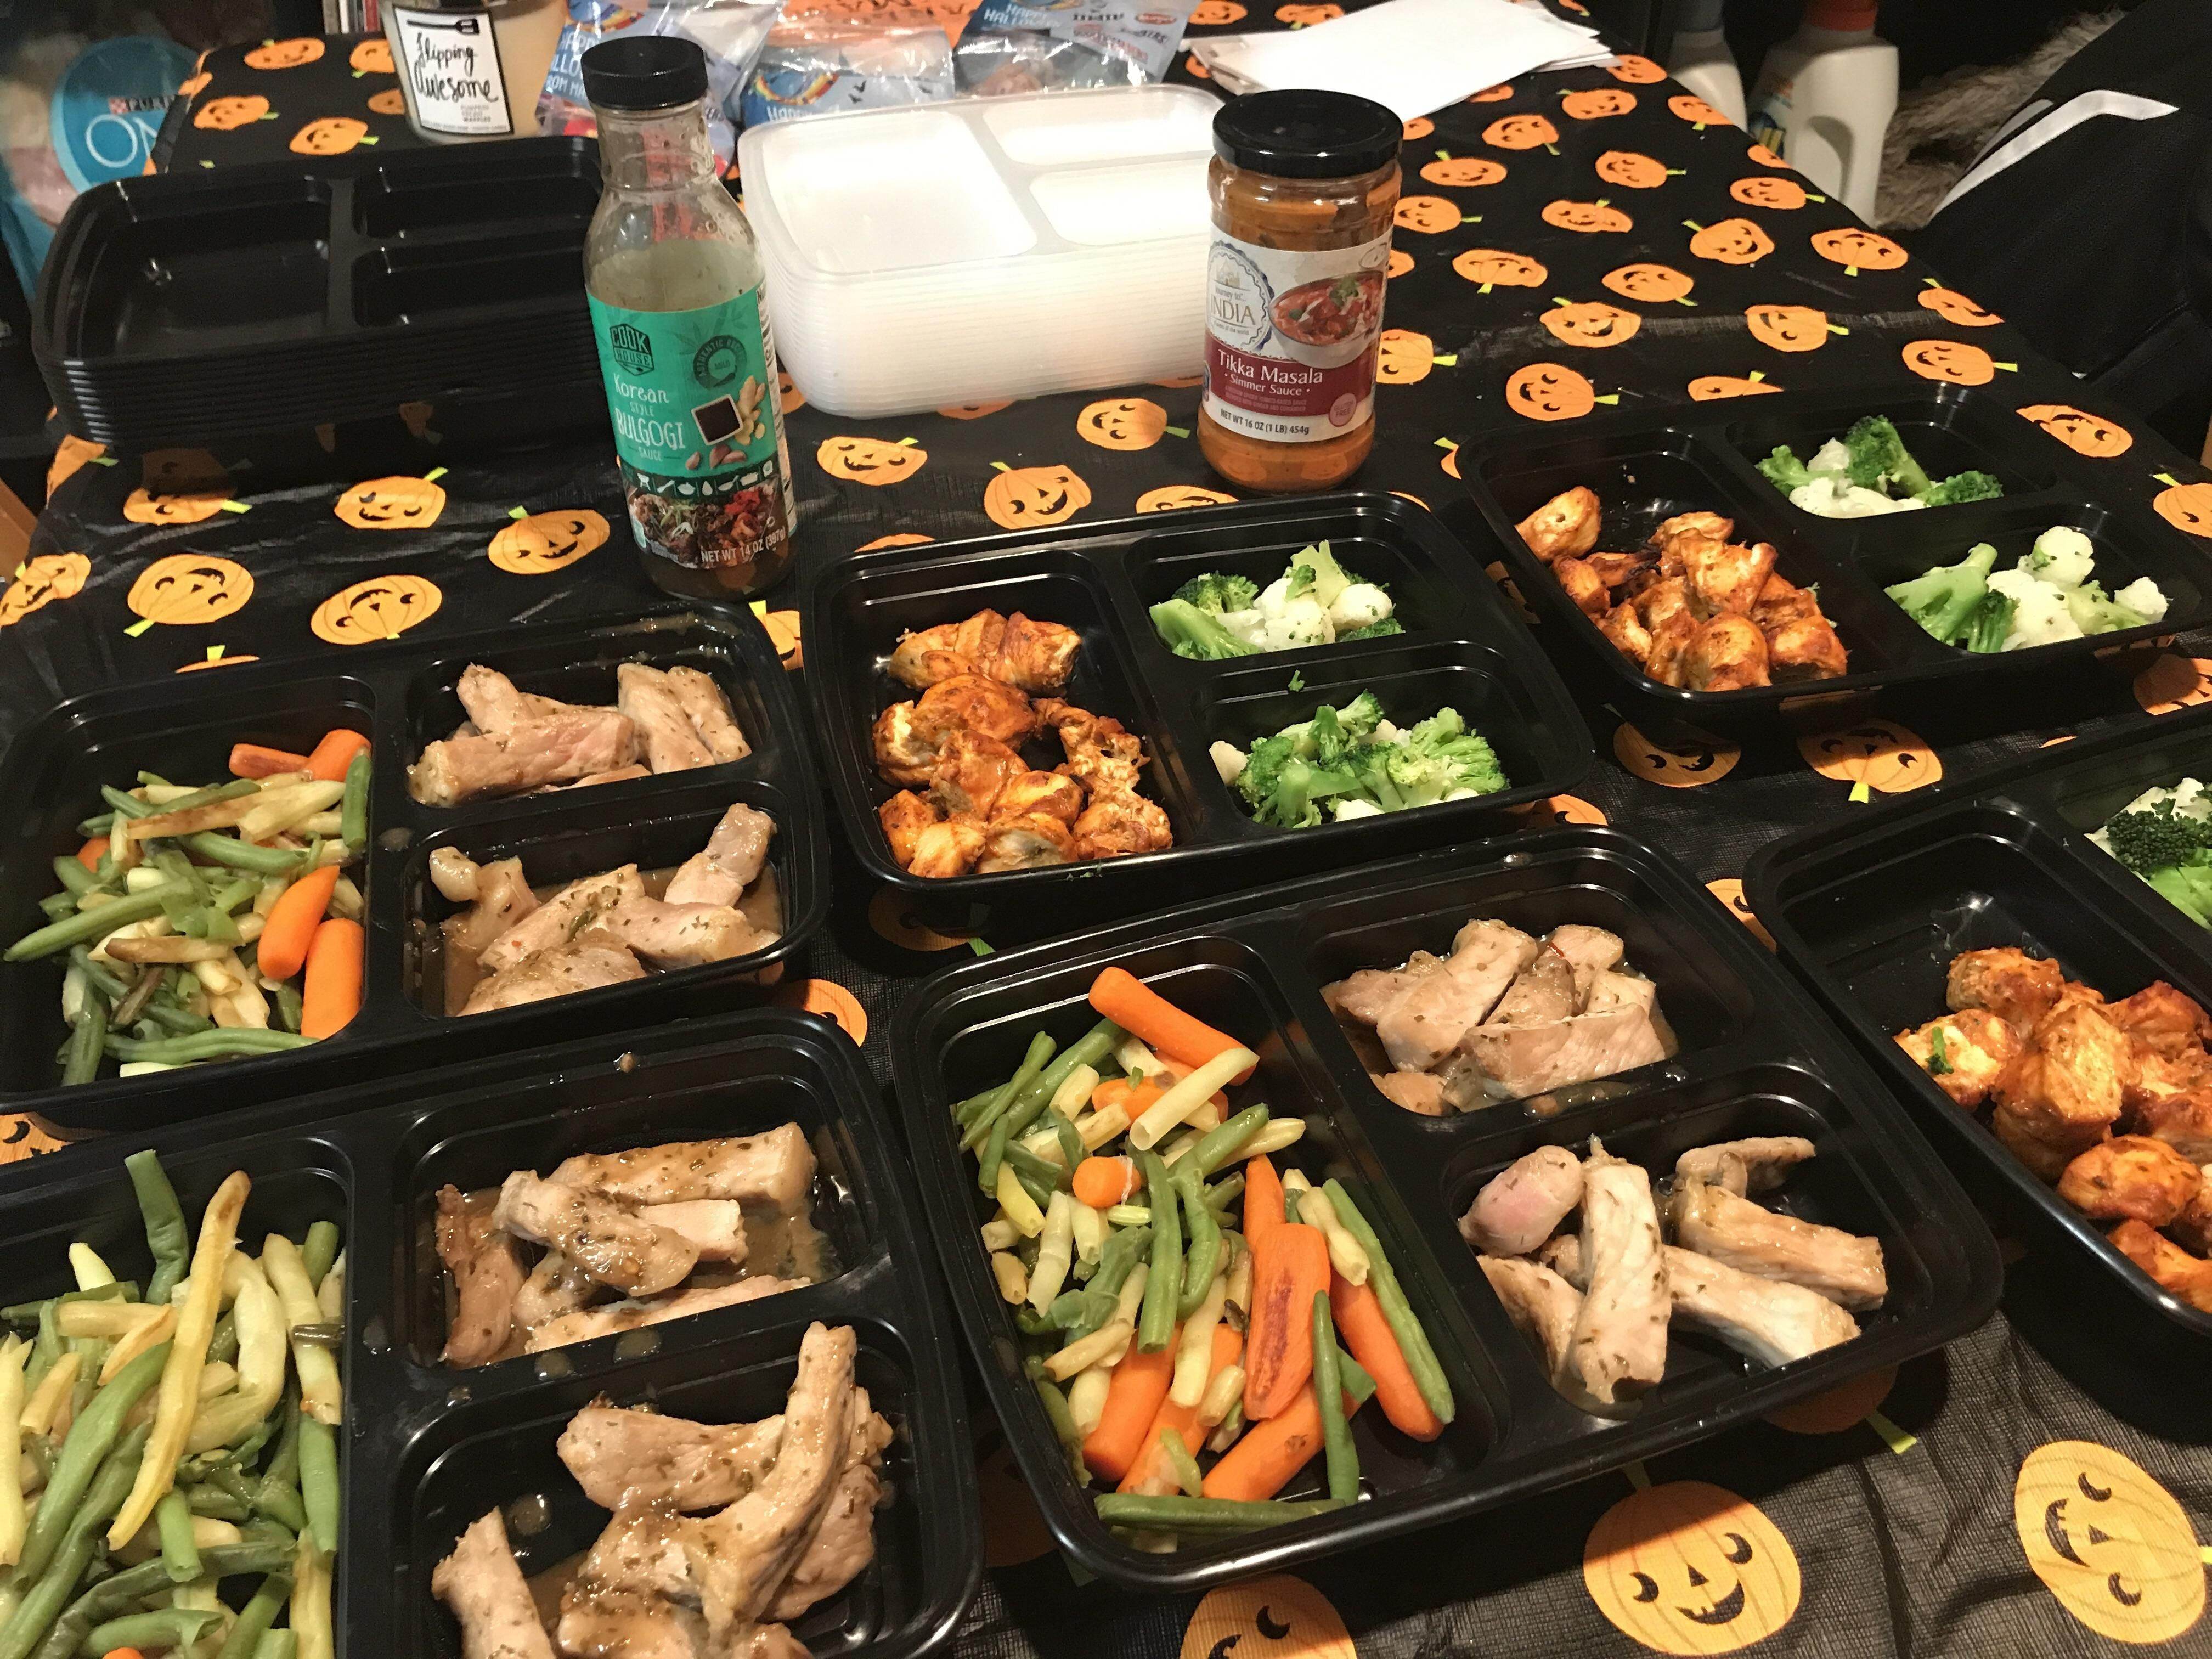 $26 for 6 lunches of pork bulgogi and chicken tikka masala ...